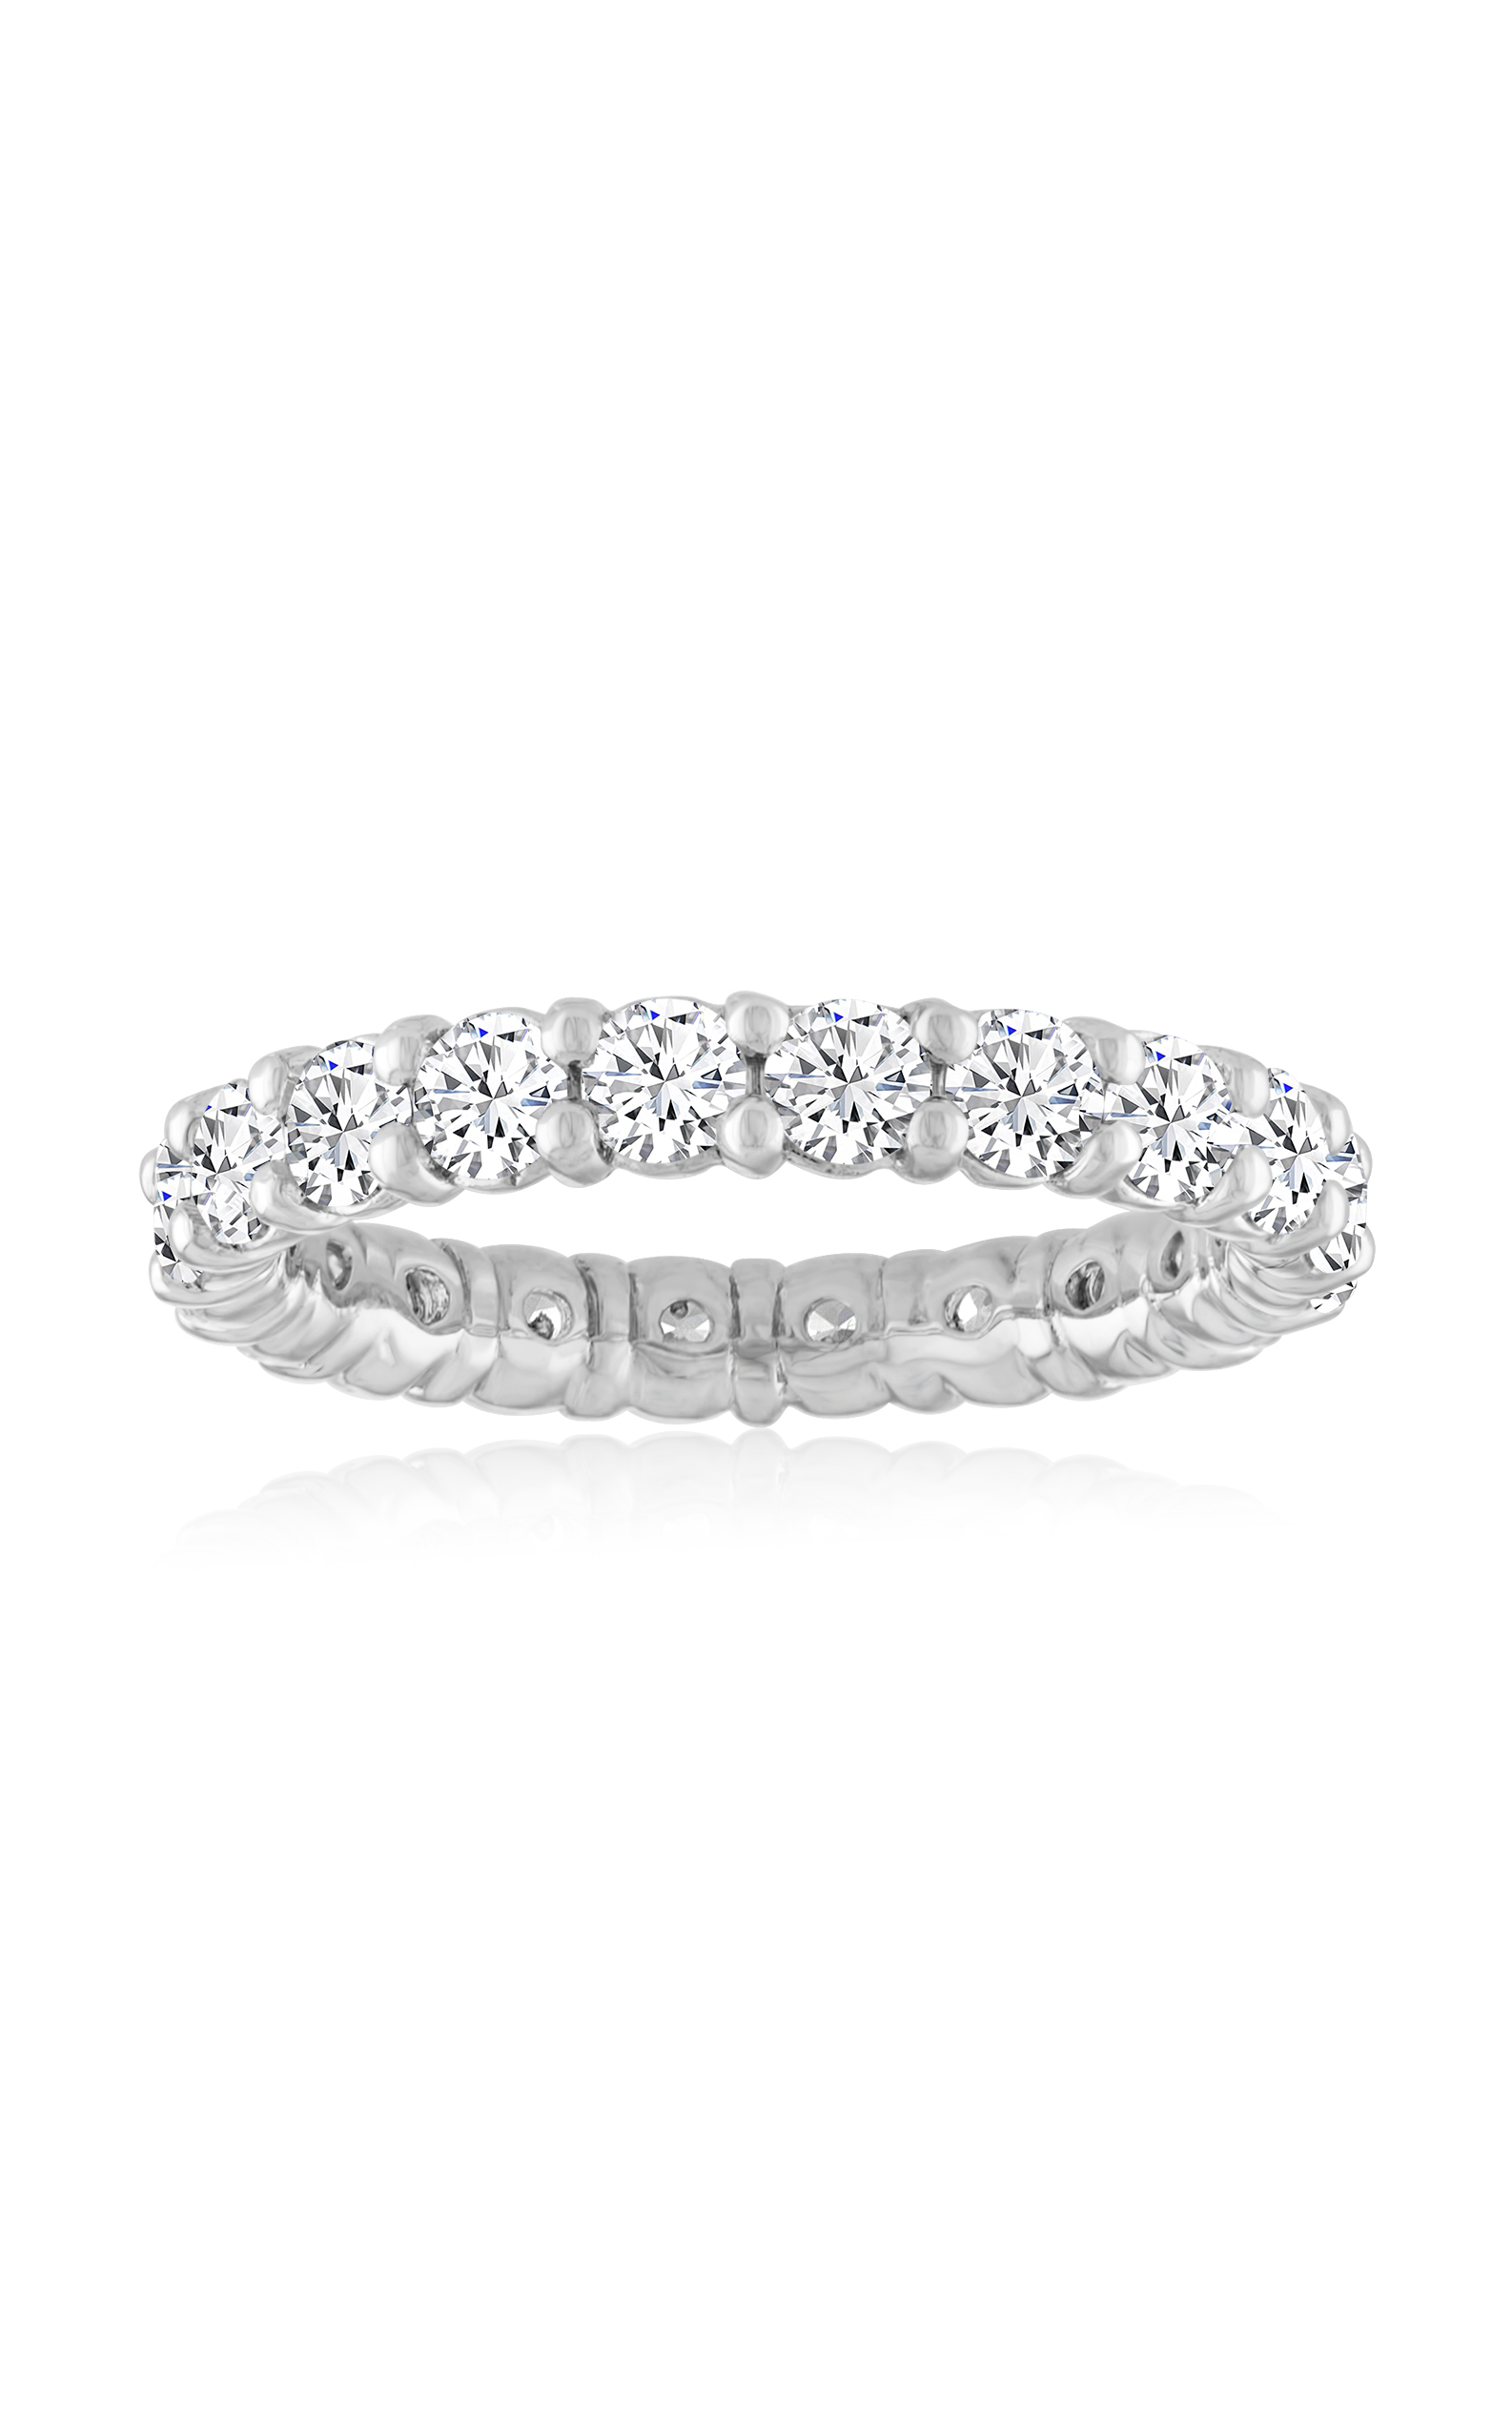 Imagine Bridal Wedding Bands 86076D-5 product image